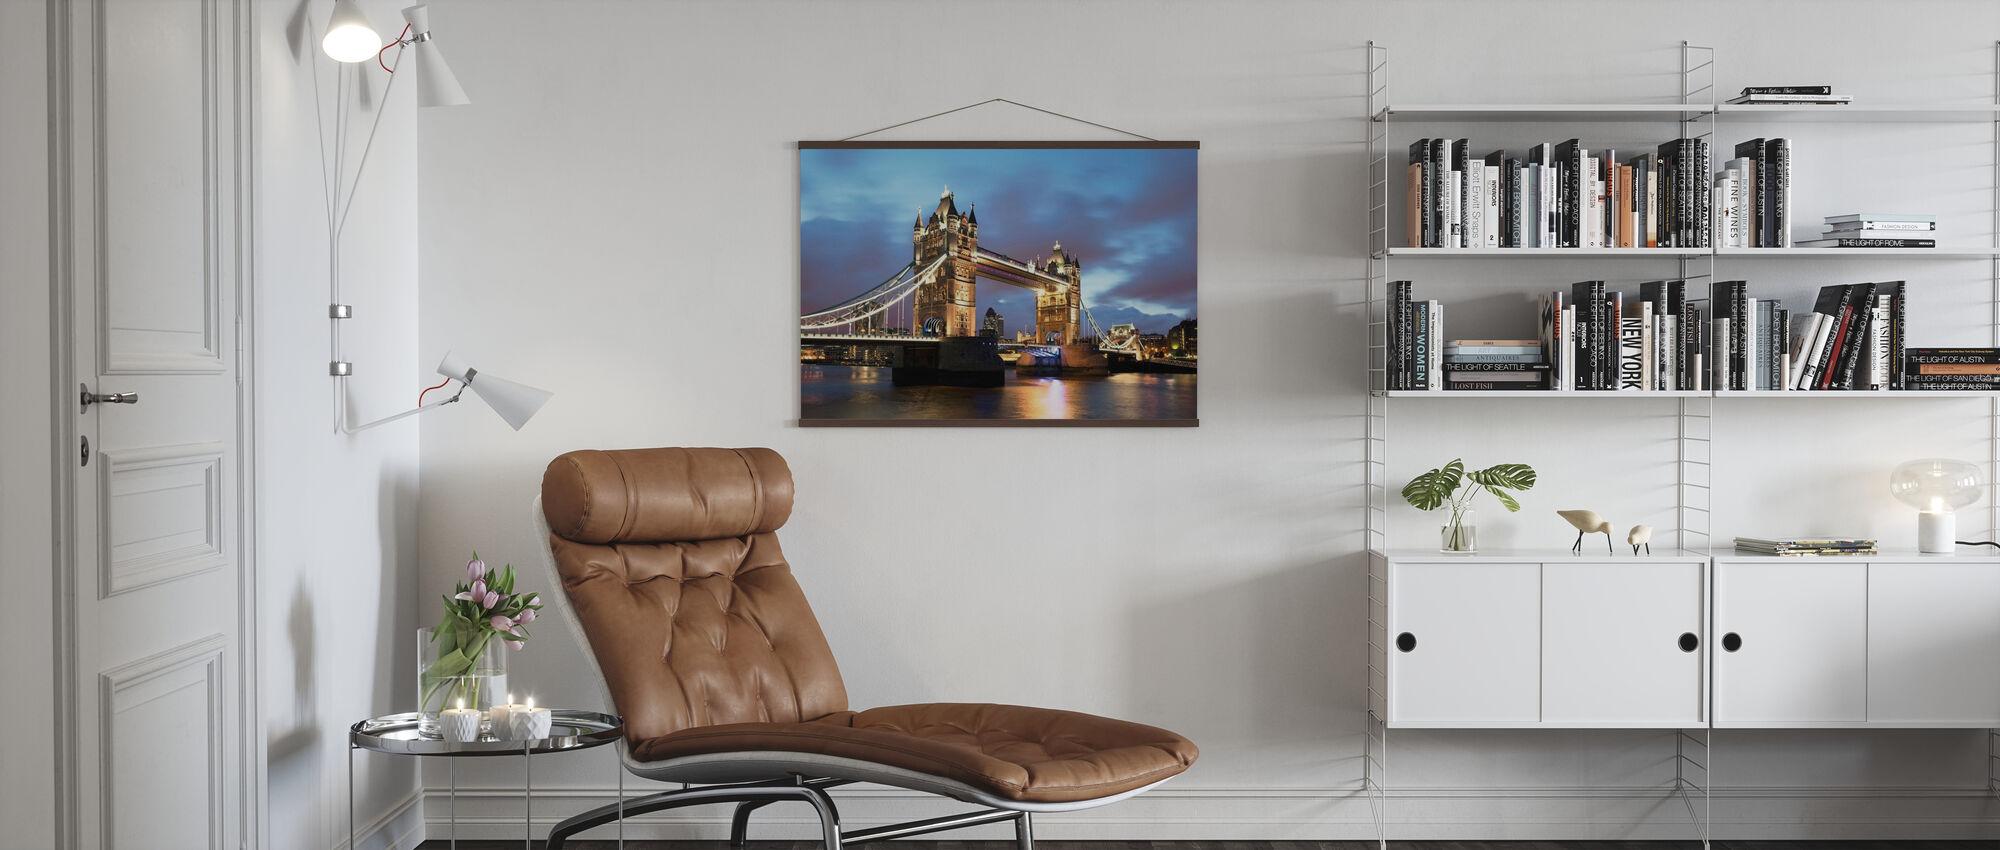 Iconic Bridge - Poster - Living Room